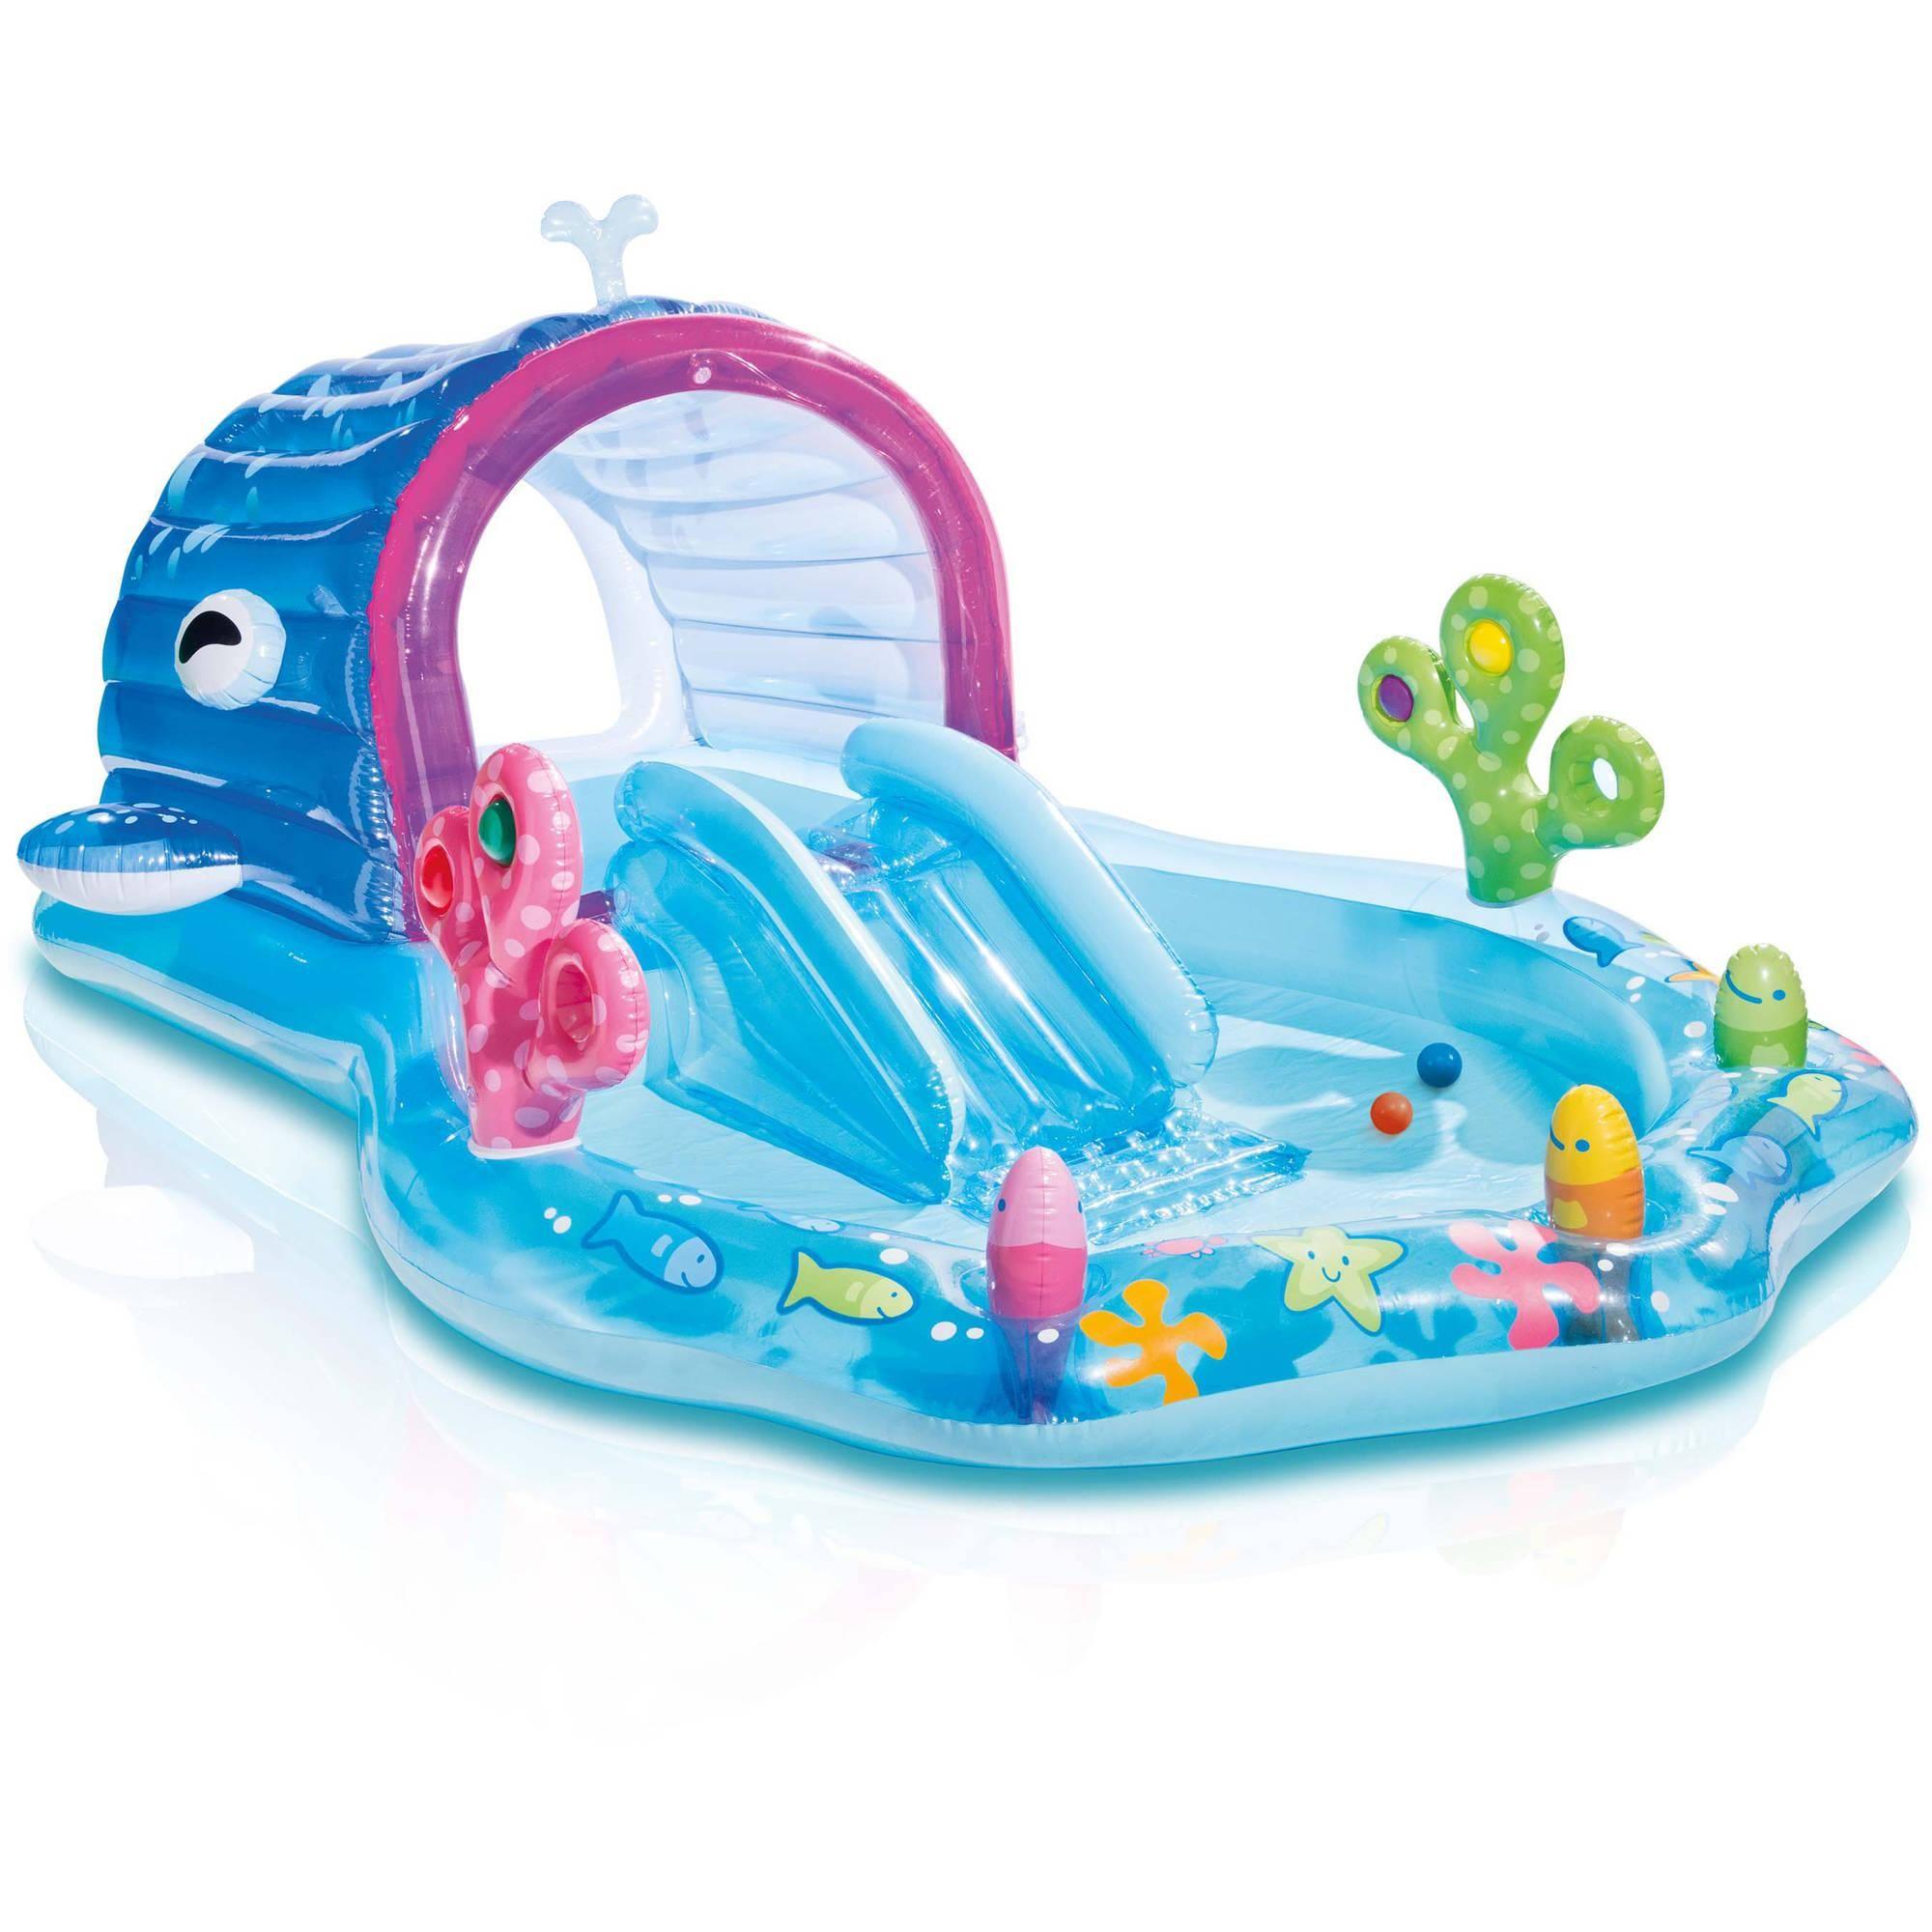 Dollar General Mini Plastic Pool 8 3 88 Er Than